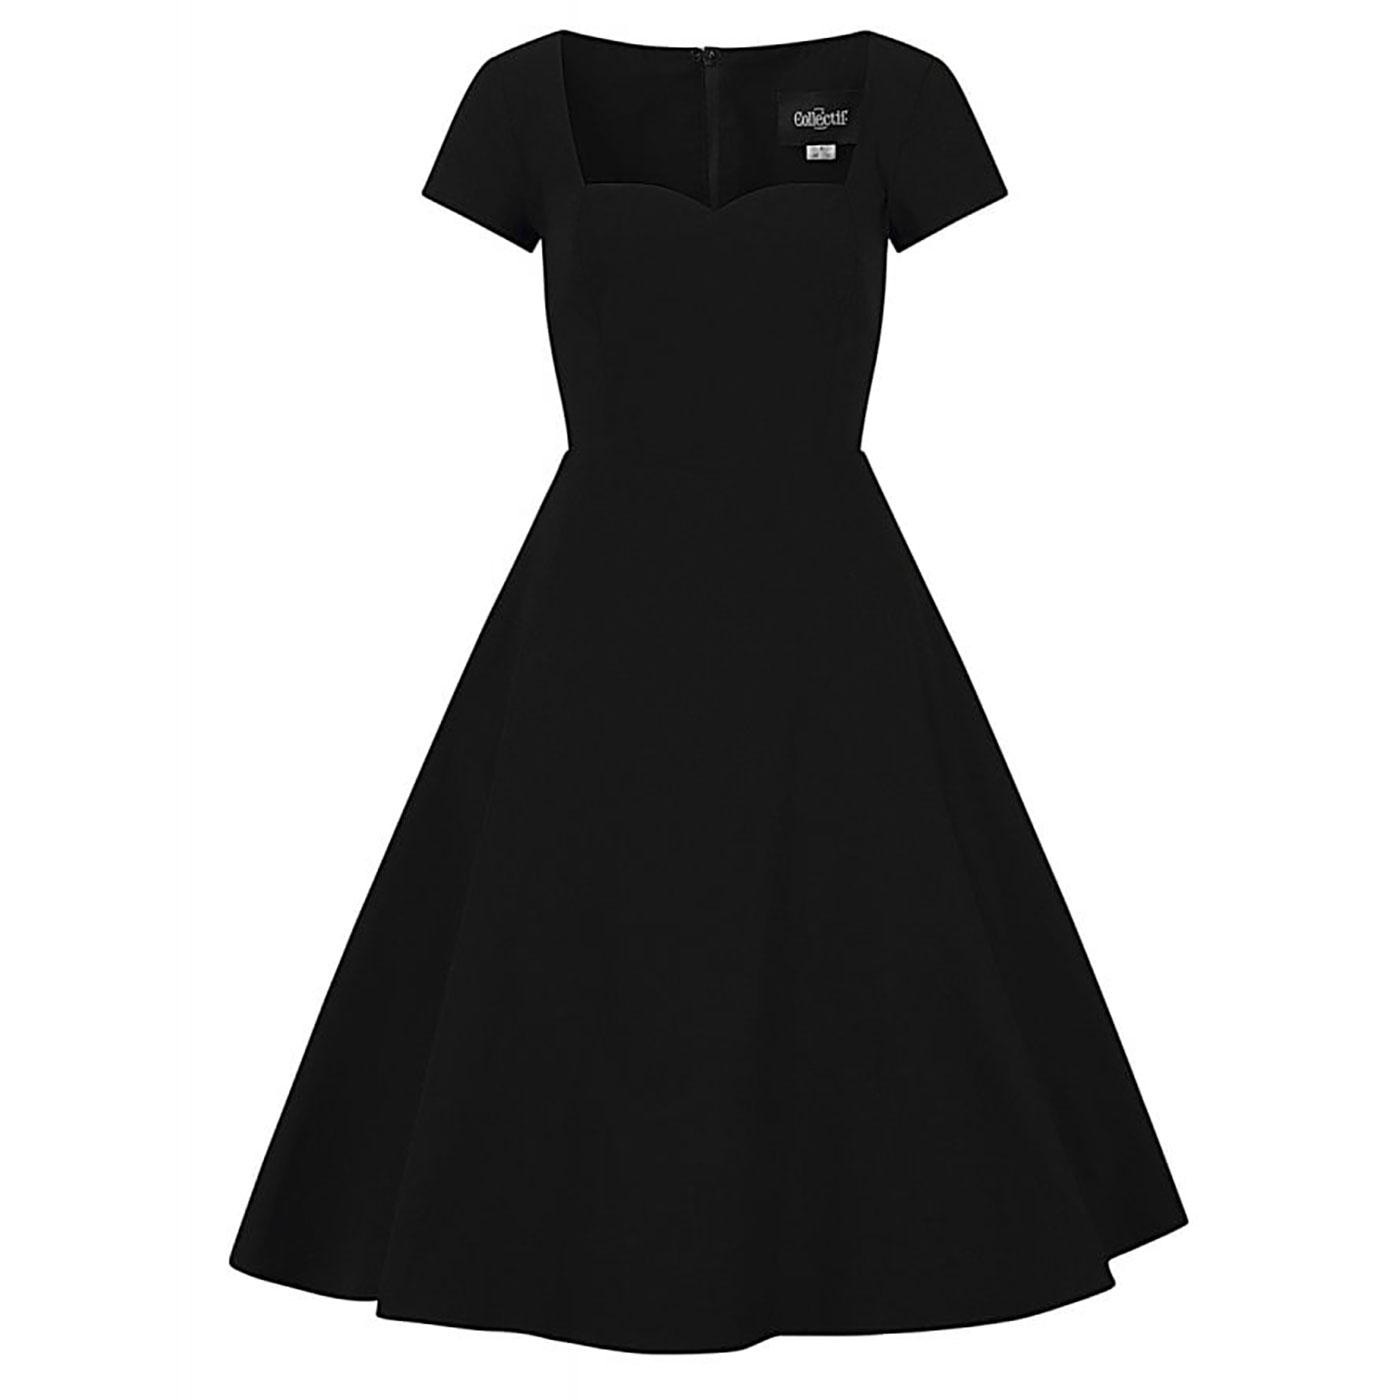 Kristy COLLECTIF Vintage Plain 1950s Swing Dress